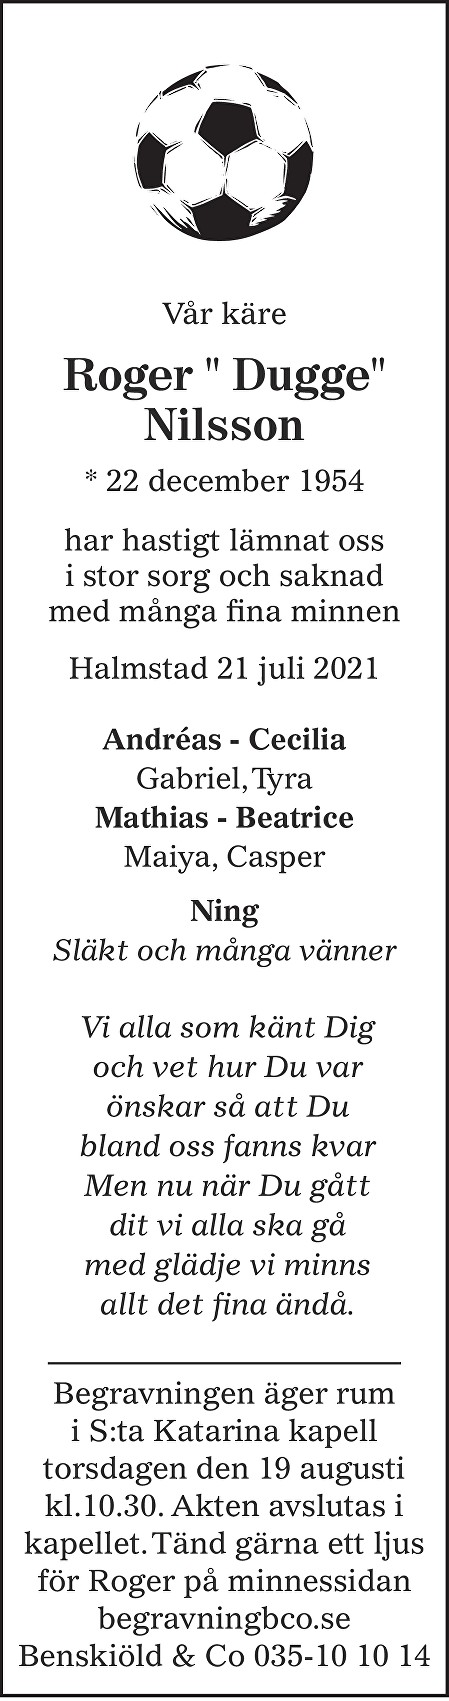 "Roger "" Dugge"" Nilsson Death notice"